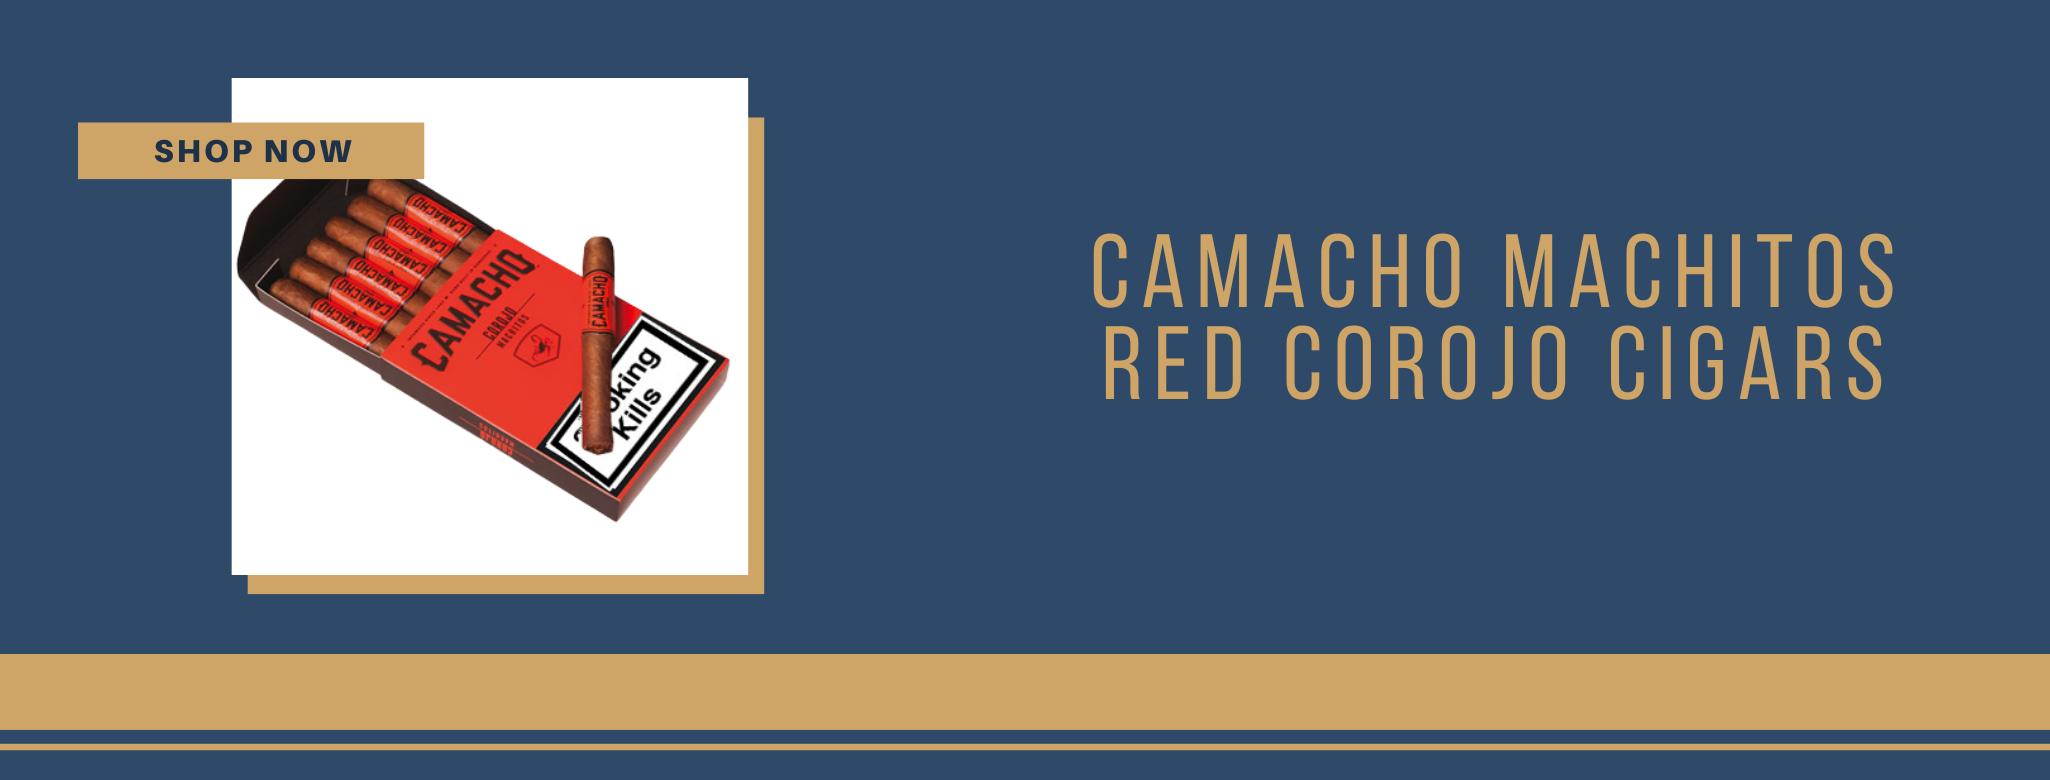 Camacho Machito Red Corojo cigars online